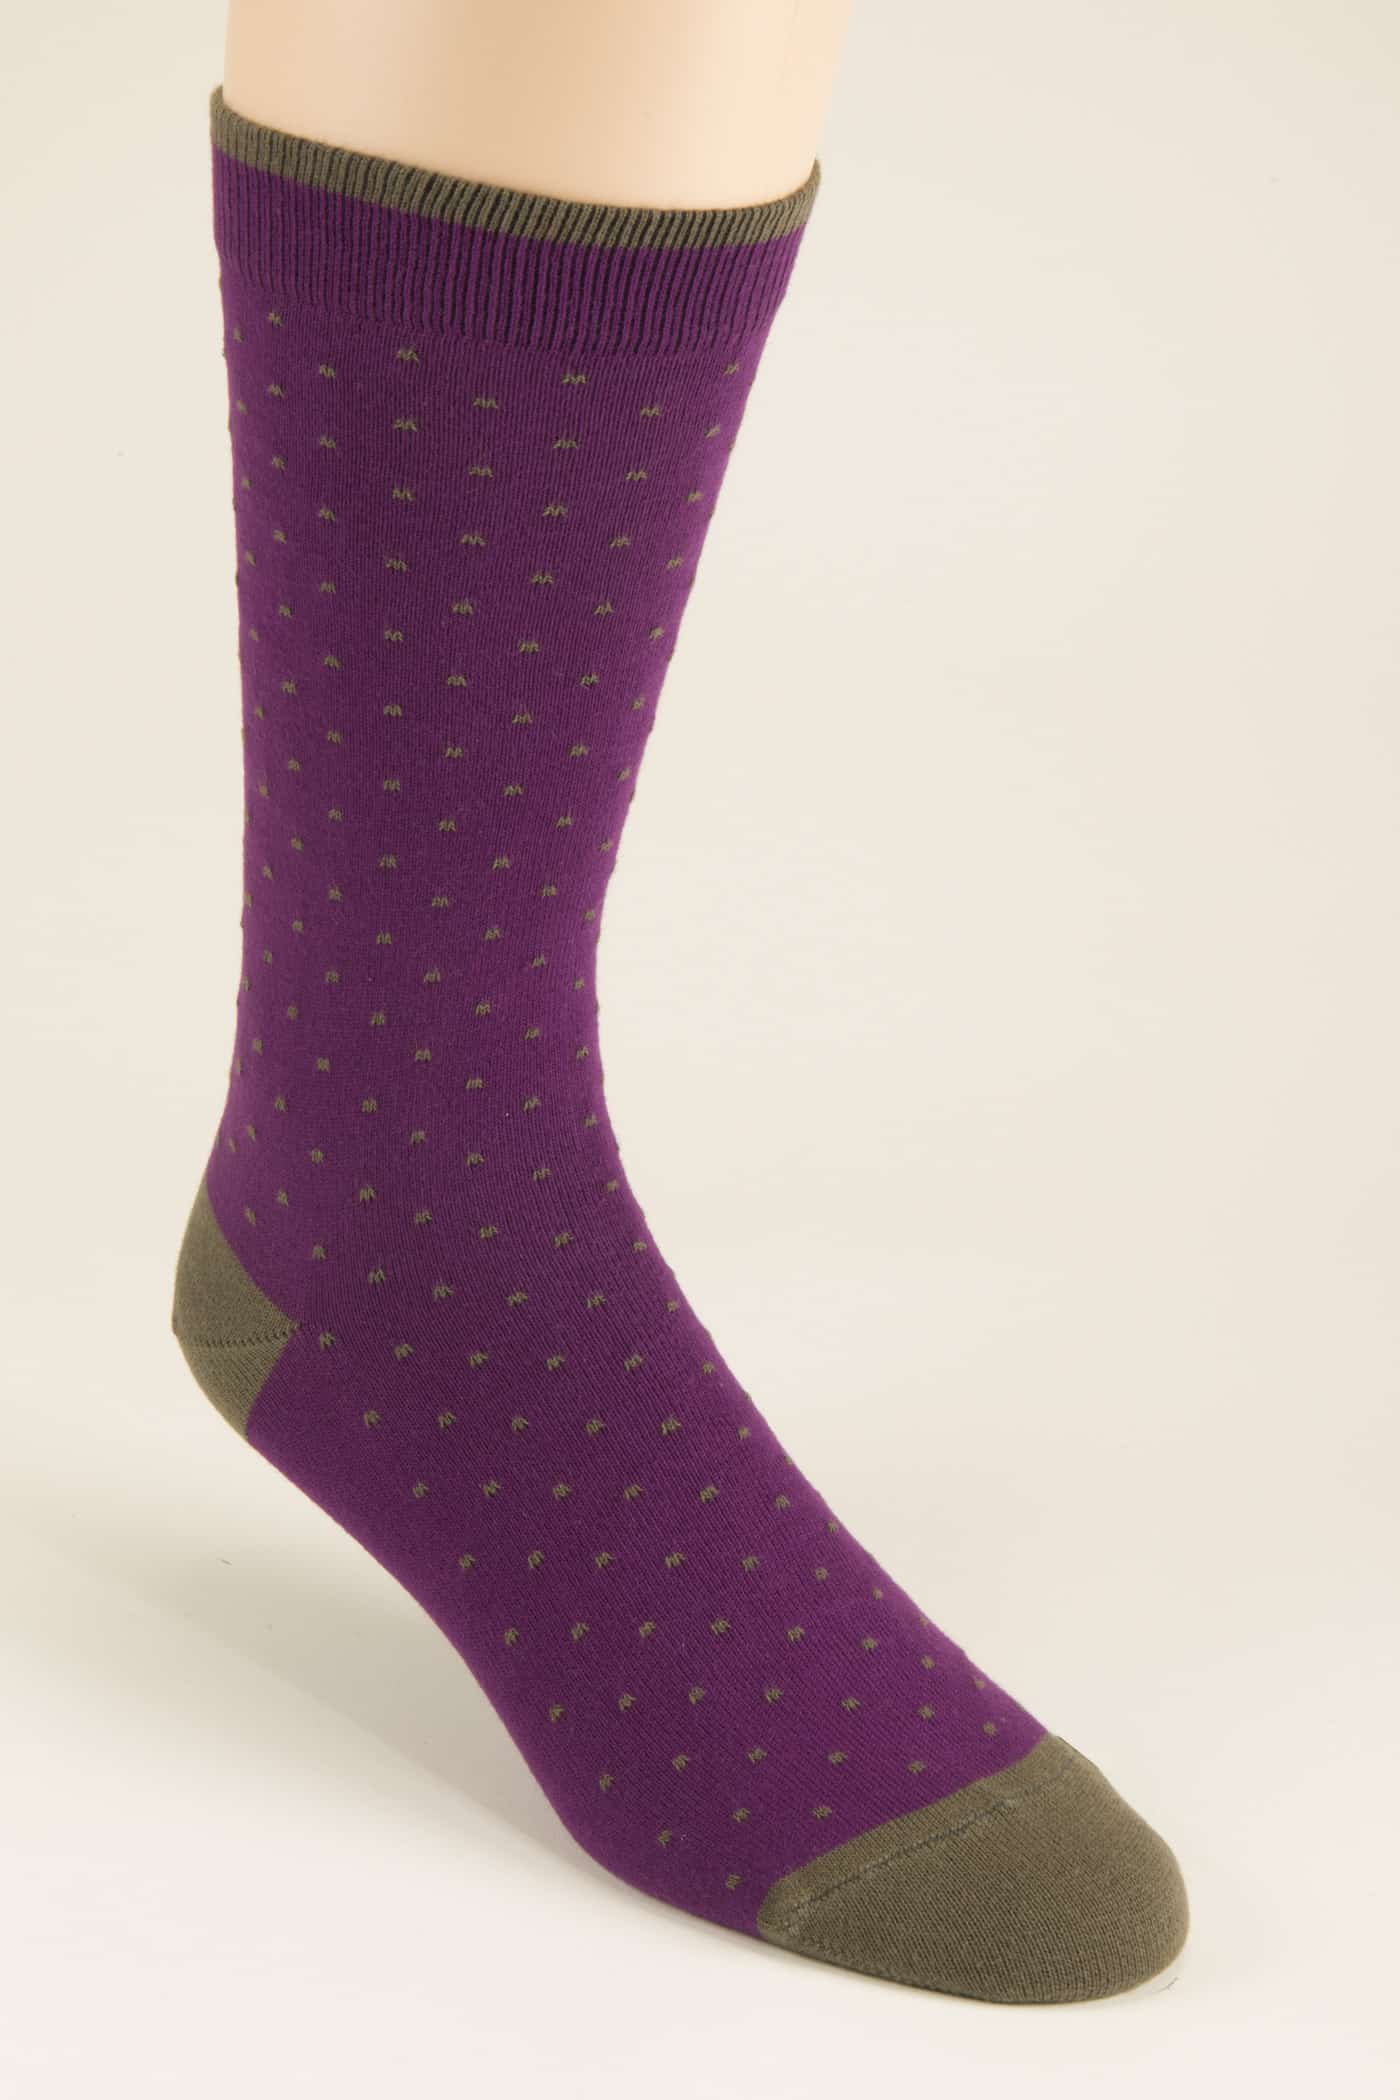 Erewash-D-Purple-Green